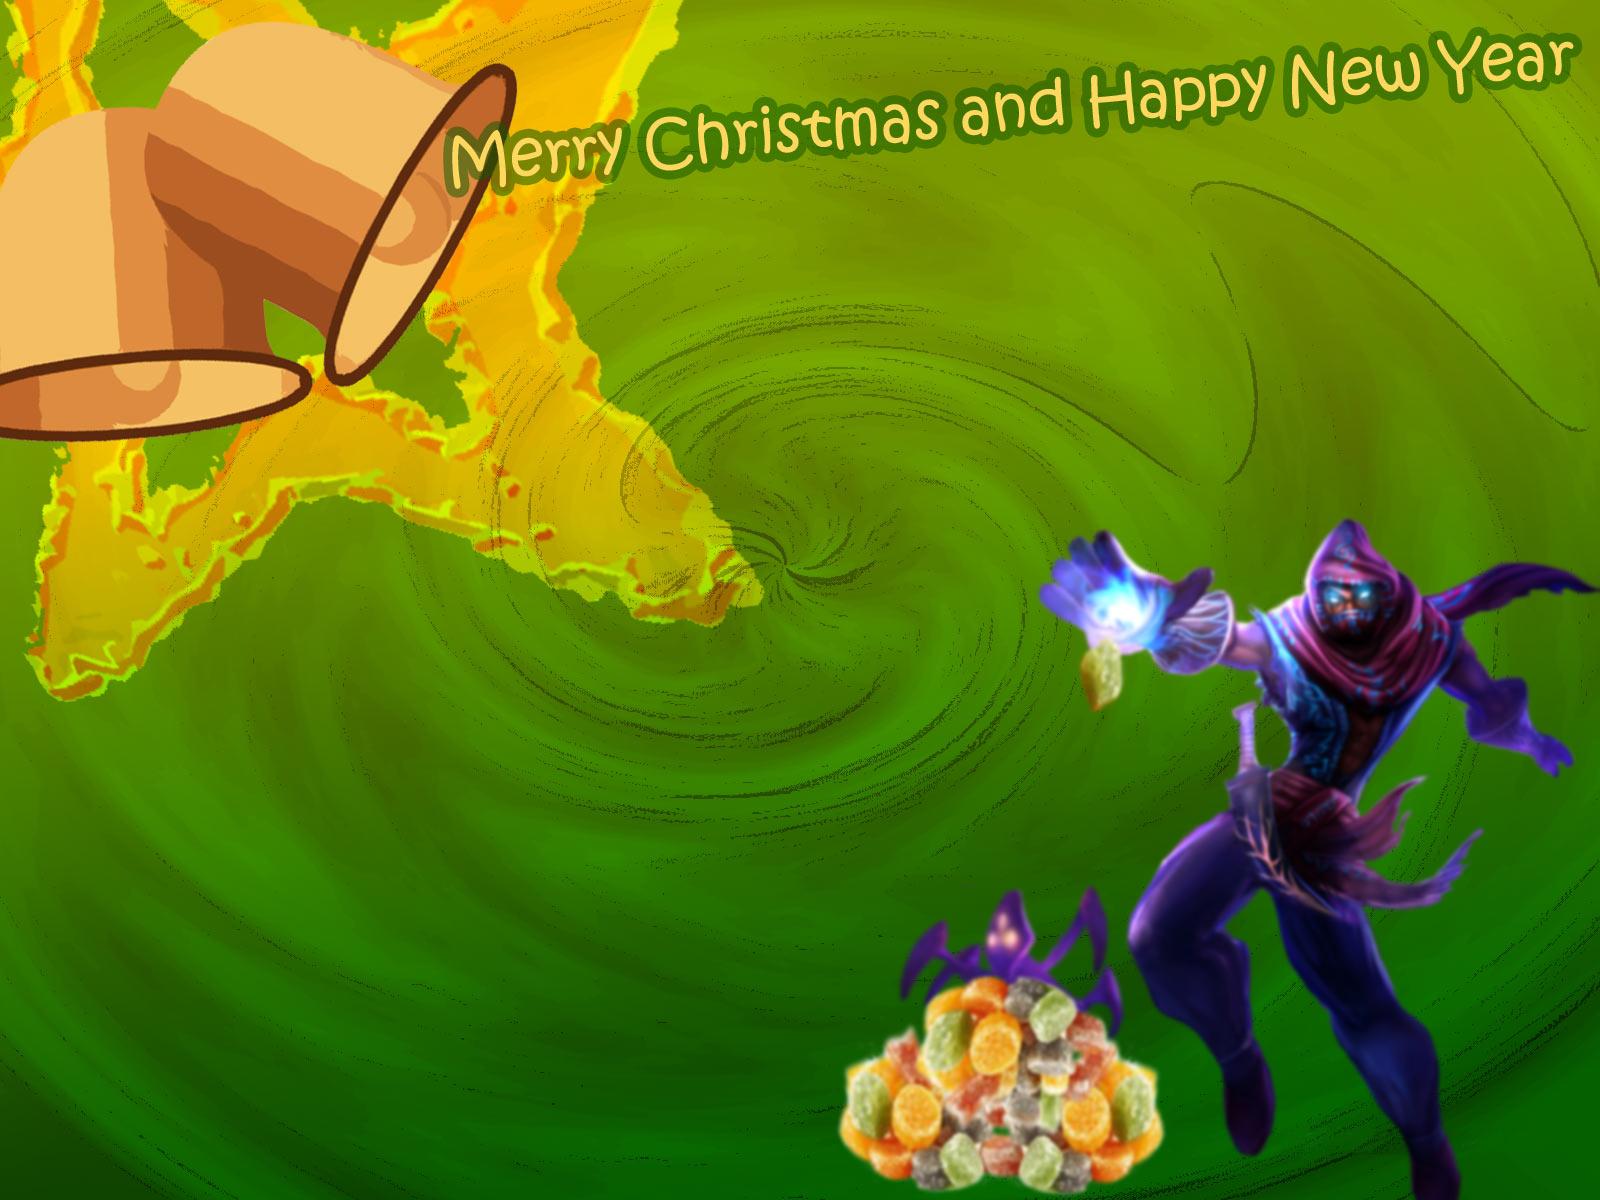 http://1.bp.blogspot.com/_L78zEKWCMII/TPGFiqnUDXI/AAAAAAAABGE/GkIC8oZQvj0/s1600/Malzahar+Christmas+Card.jpg